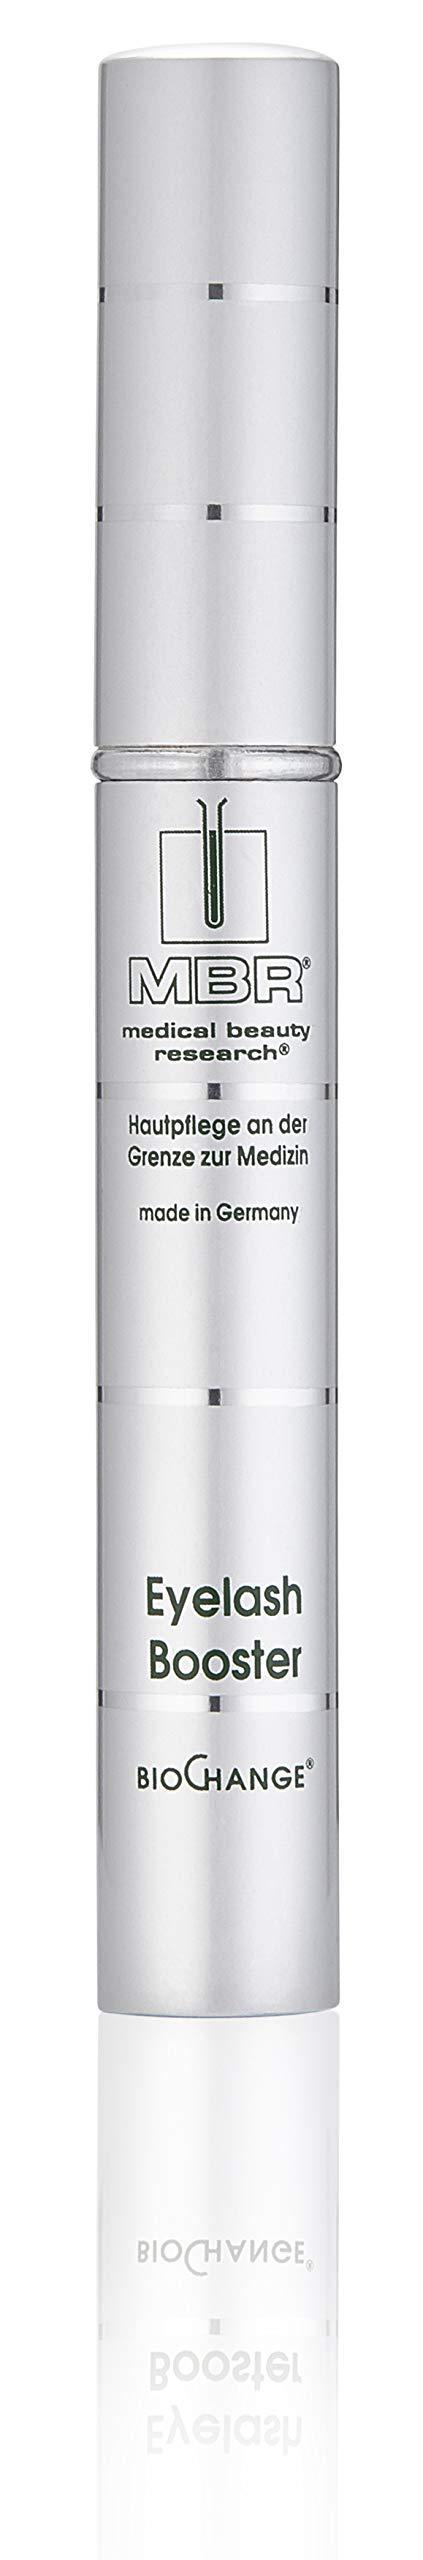 MBR Medical Beauty Research - Eyelash Booster Serum